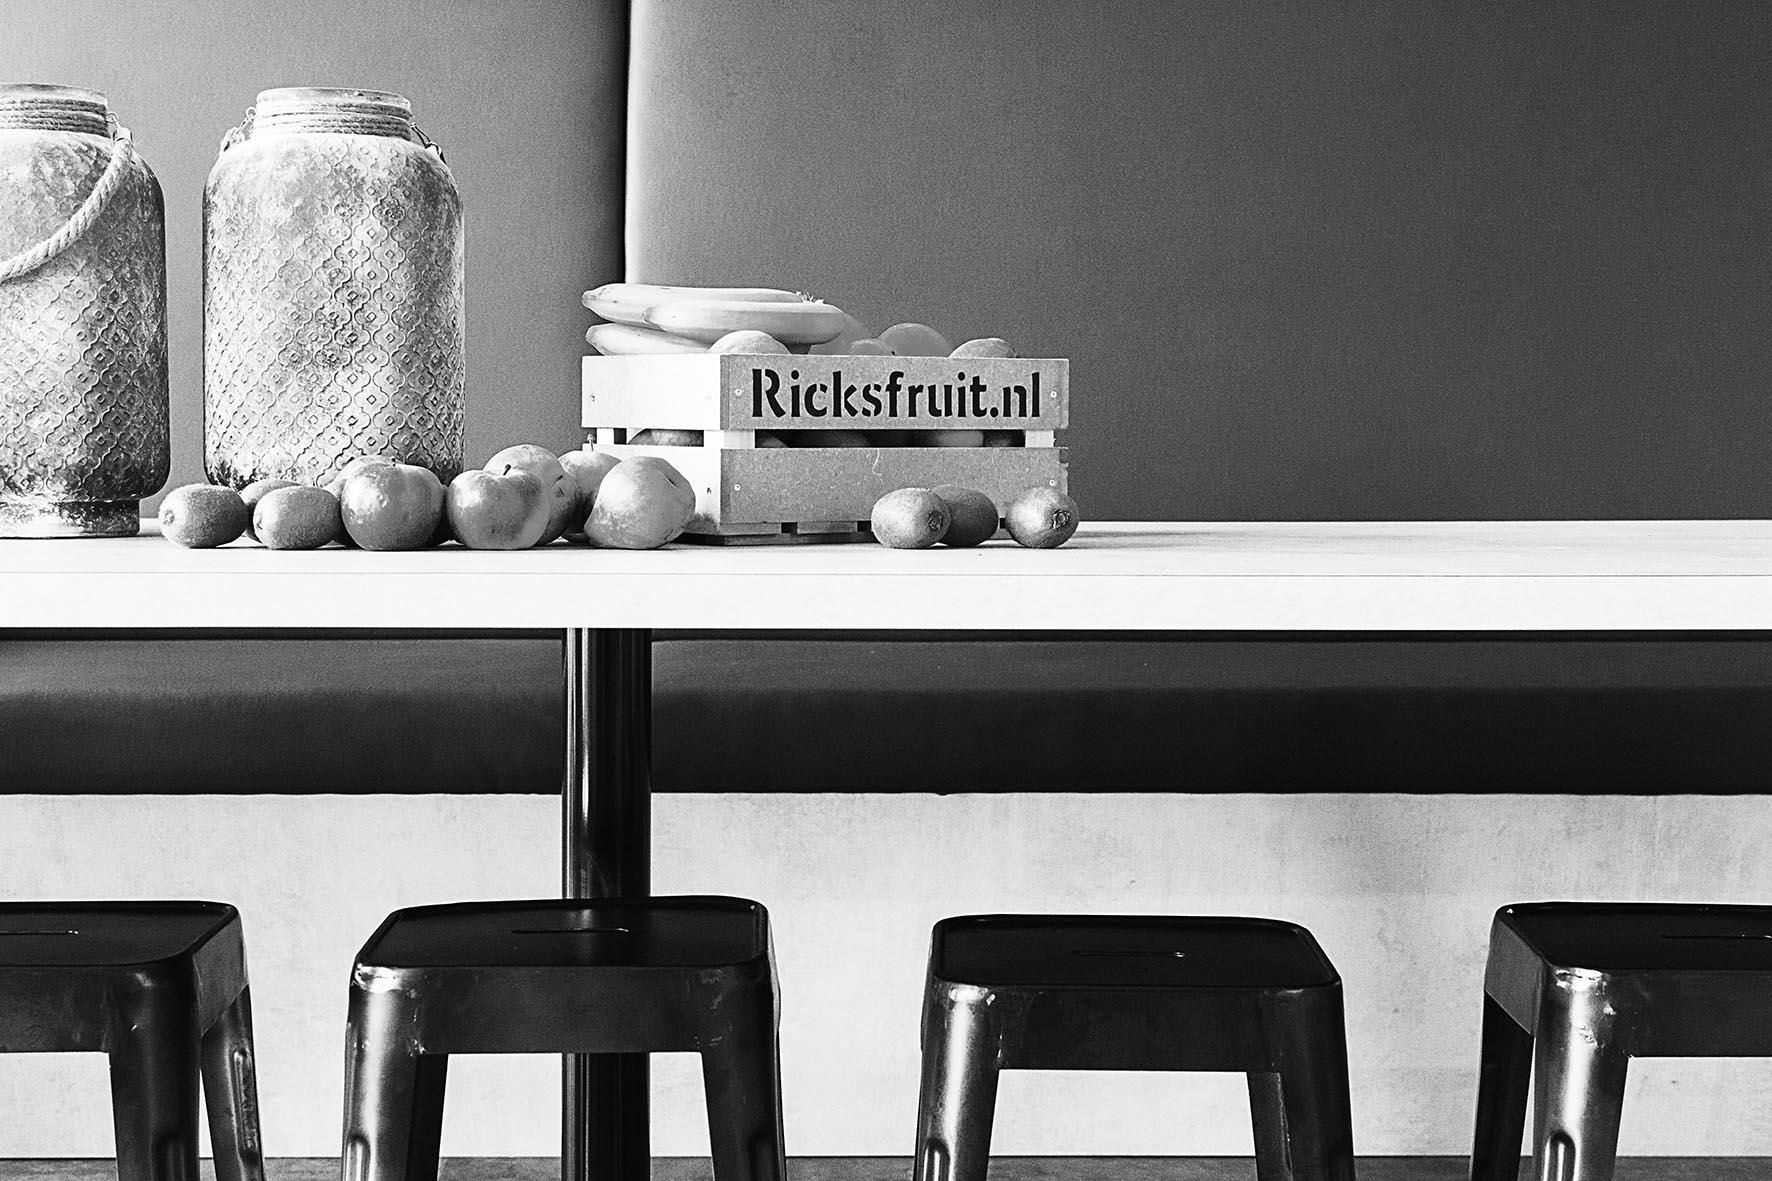 Ricks fruit impressie